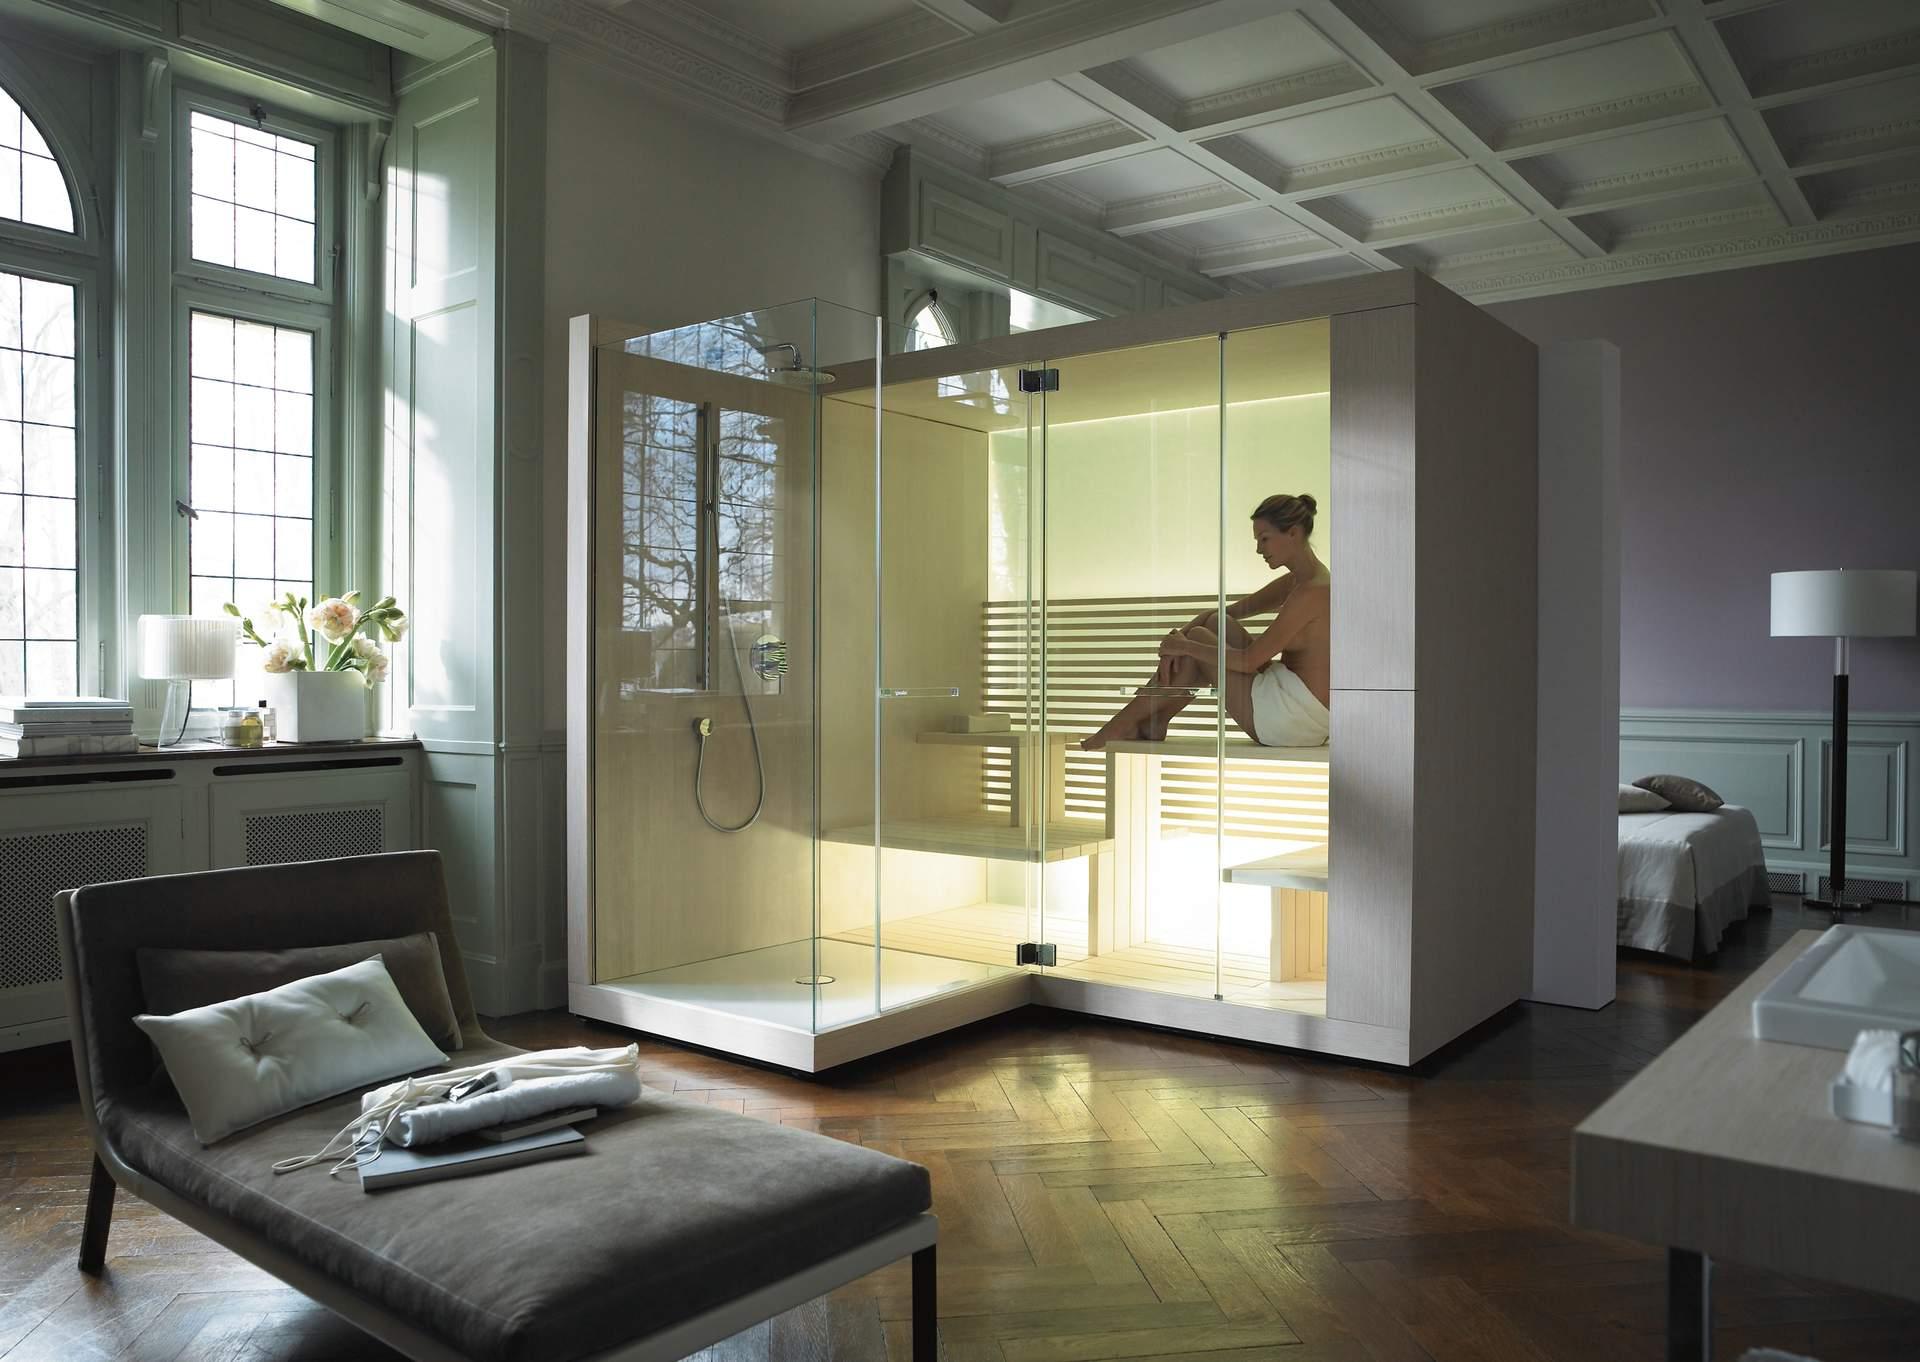 Finest inipi with costo sauna per casa - Prezzi sauna per casa ...